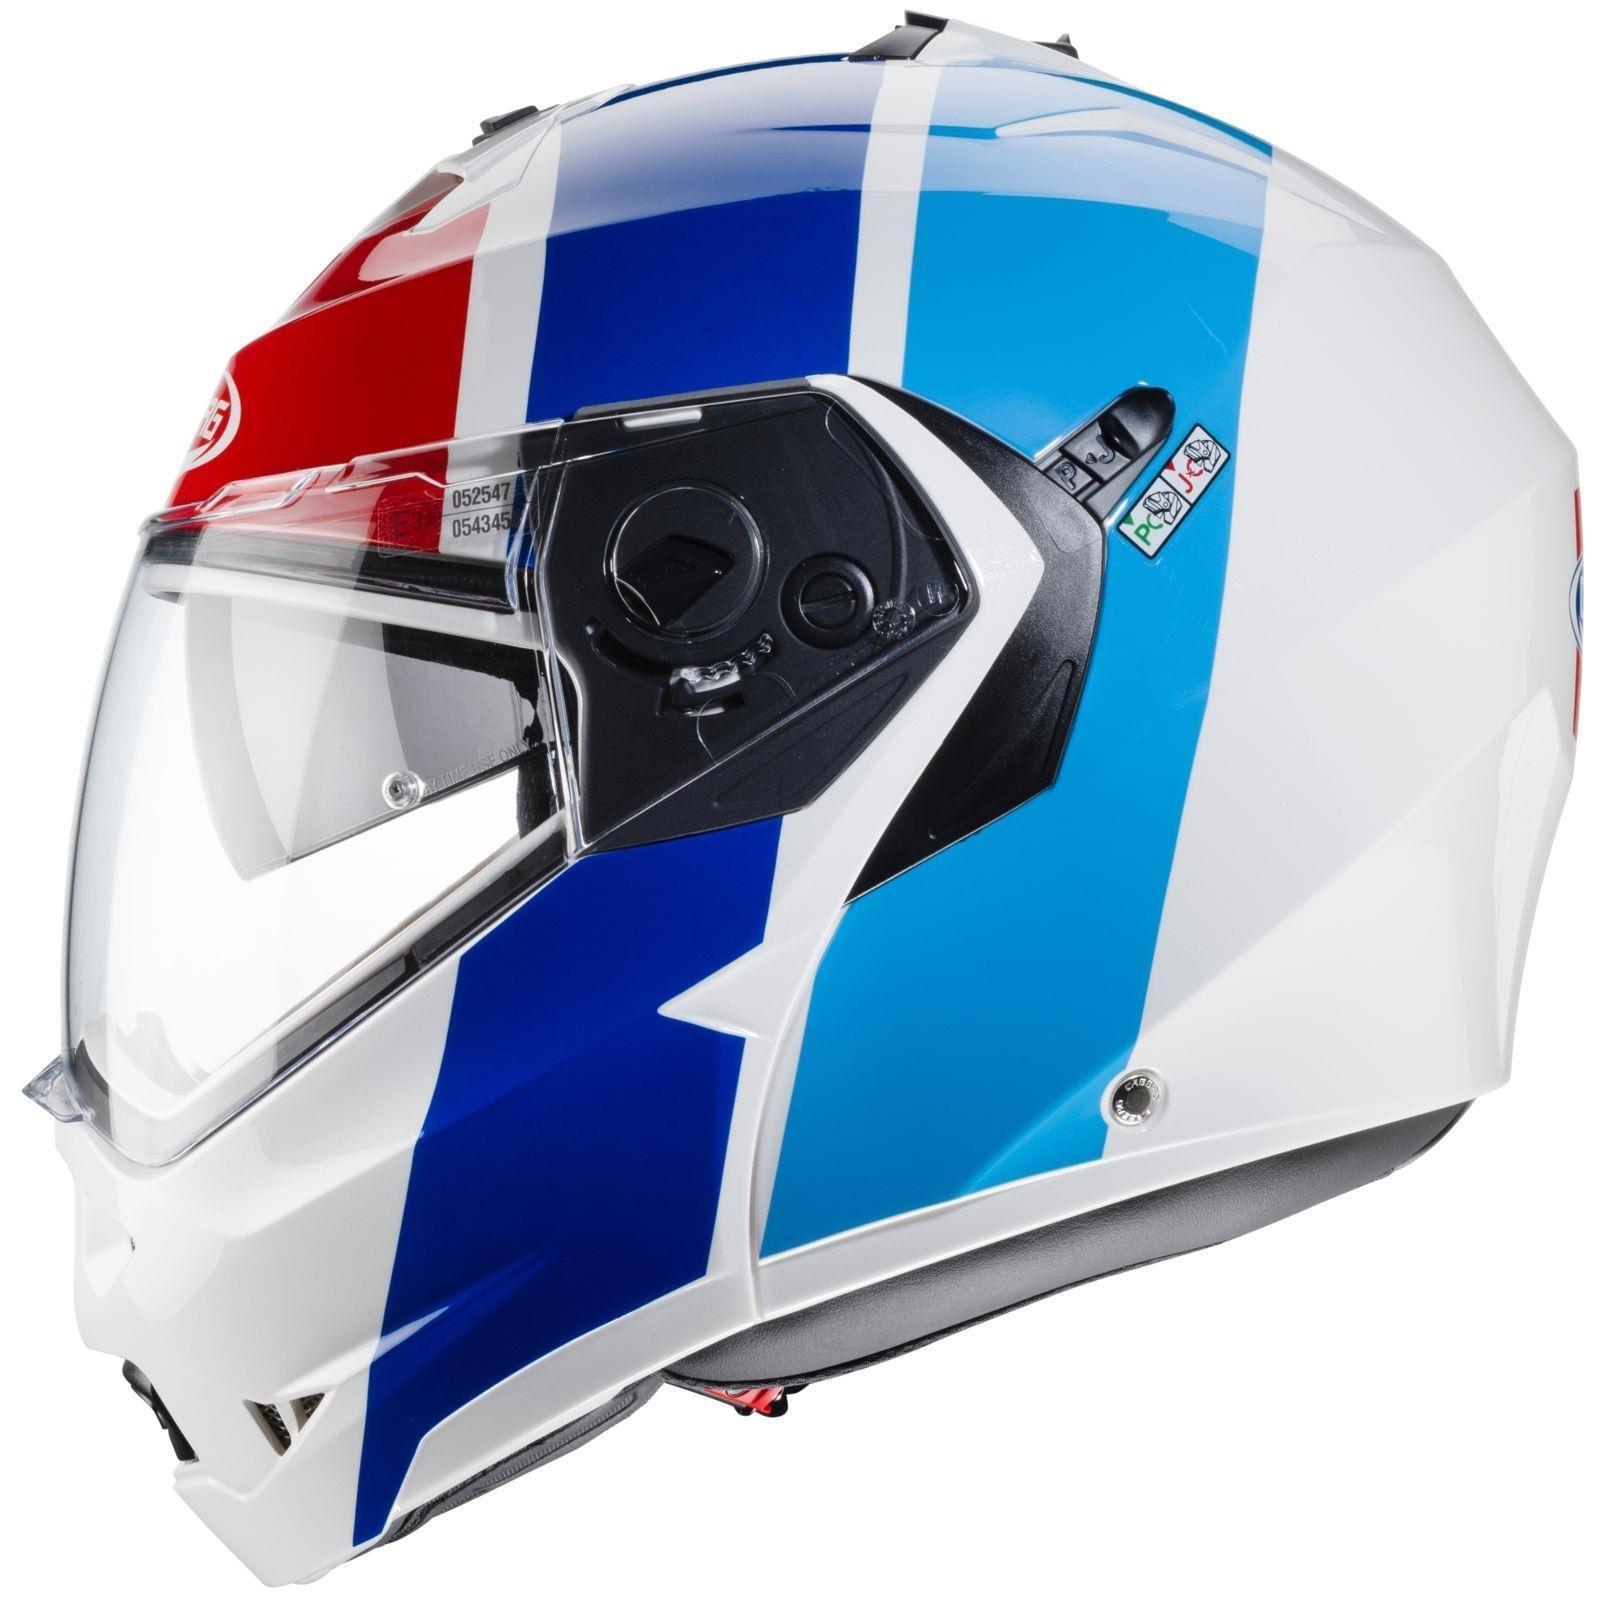 Caberg-Klapp-Helm-Duke-II-2-Motorrad-Belueftet-Sonnenblende-Pinlock-Visier-Jet Indexbild 30